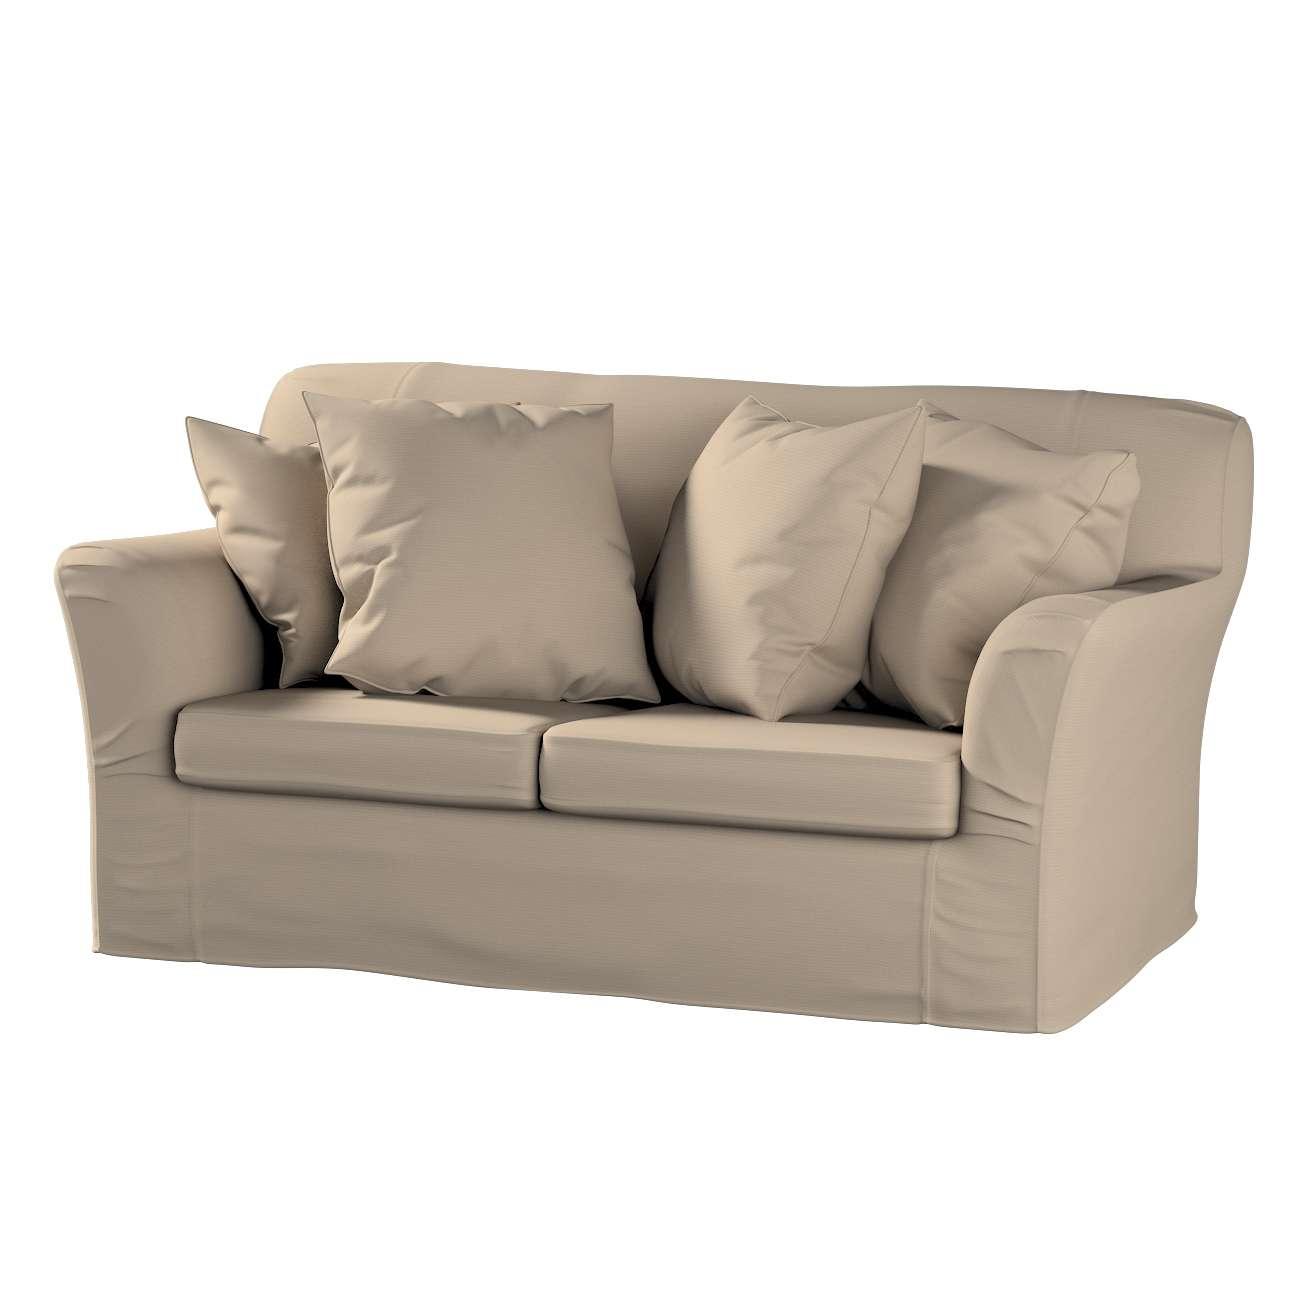 Tomelilla 2-seater sofa cover in collection Panama Cotton, fabric: 702-28